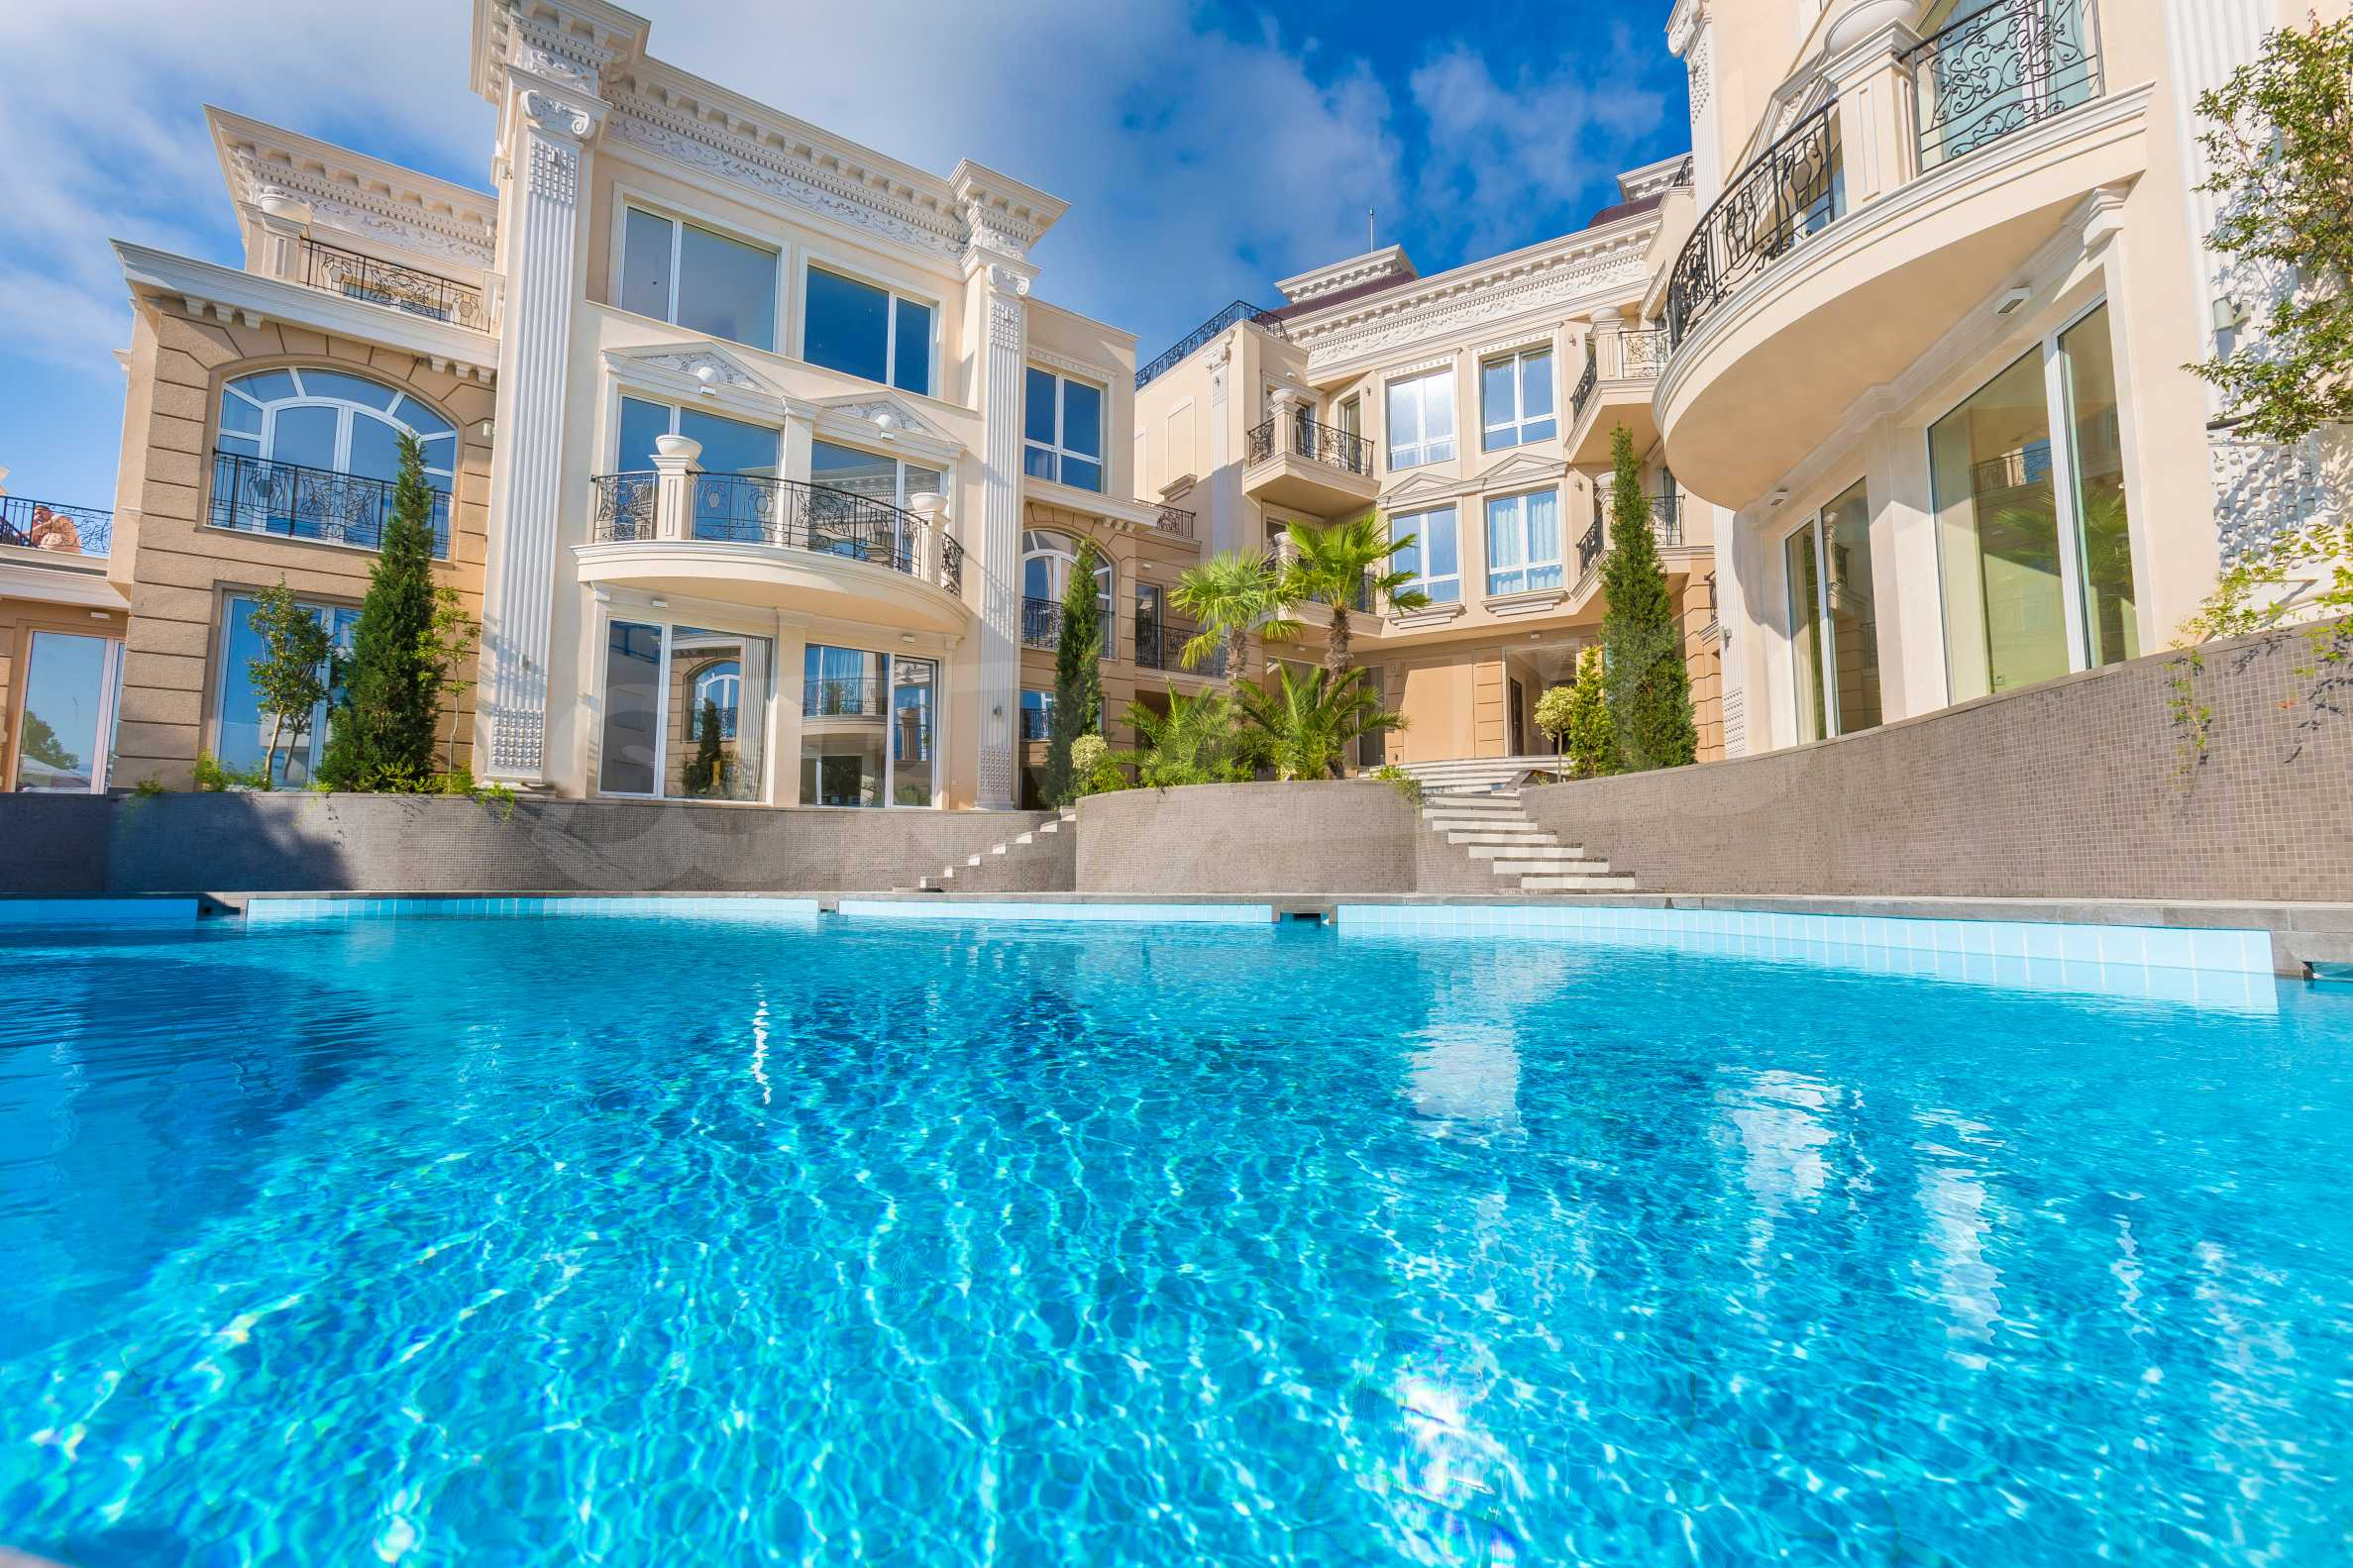 Комфортен двустаен апартамент под наем в Belle Époque Beach Residence, курорт Лозенец 4